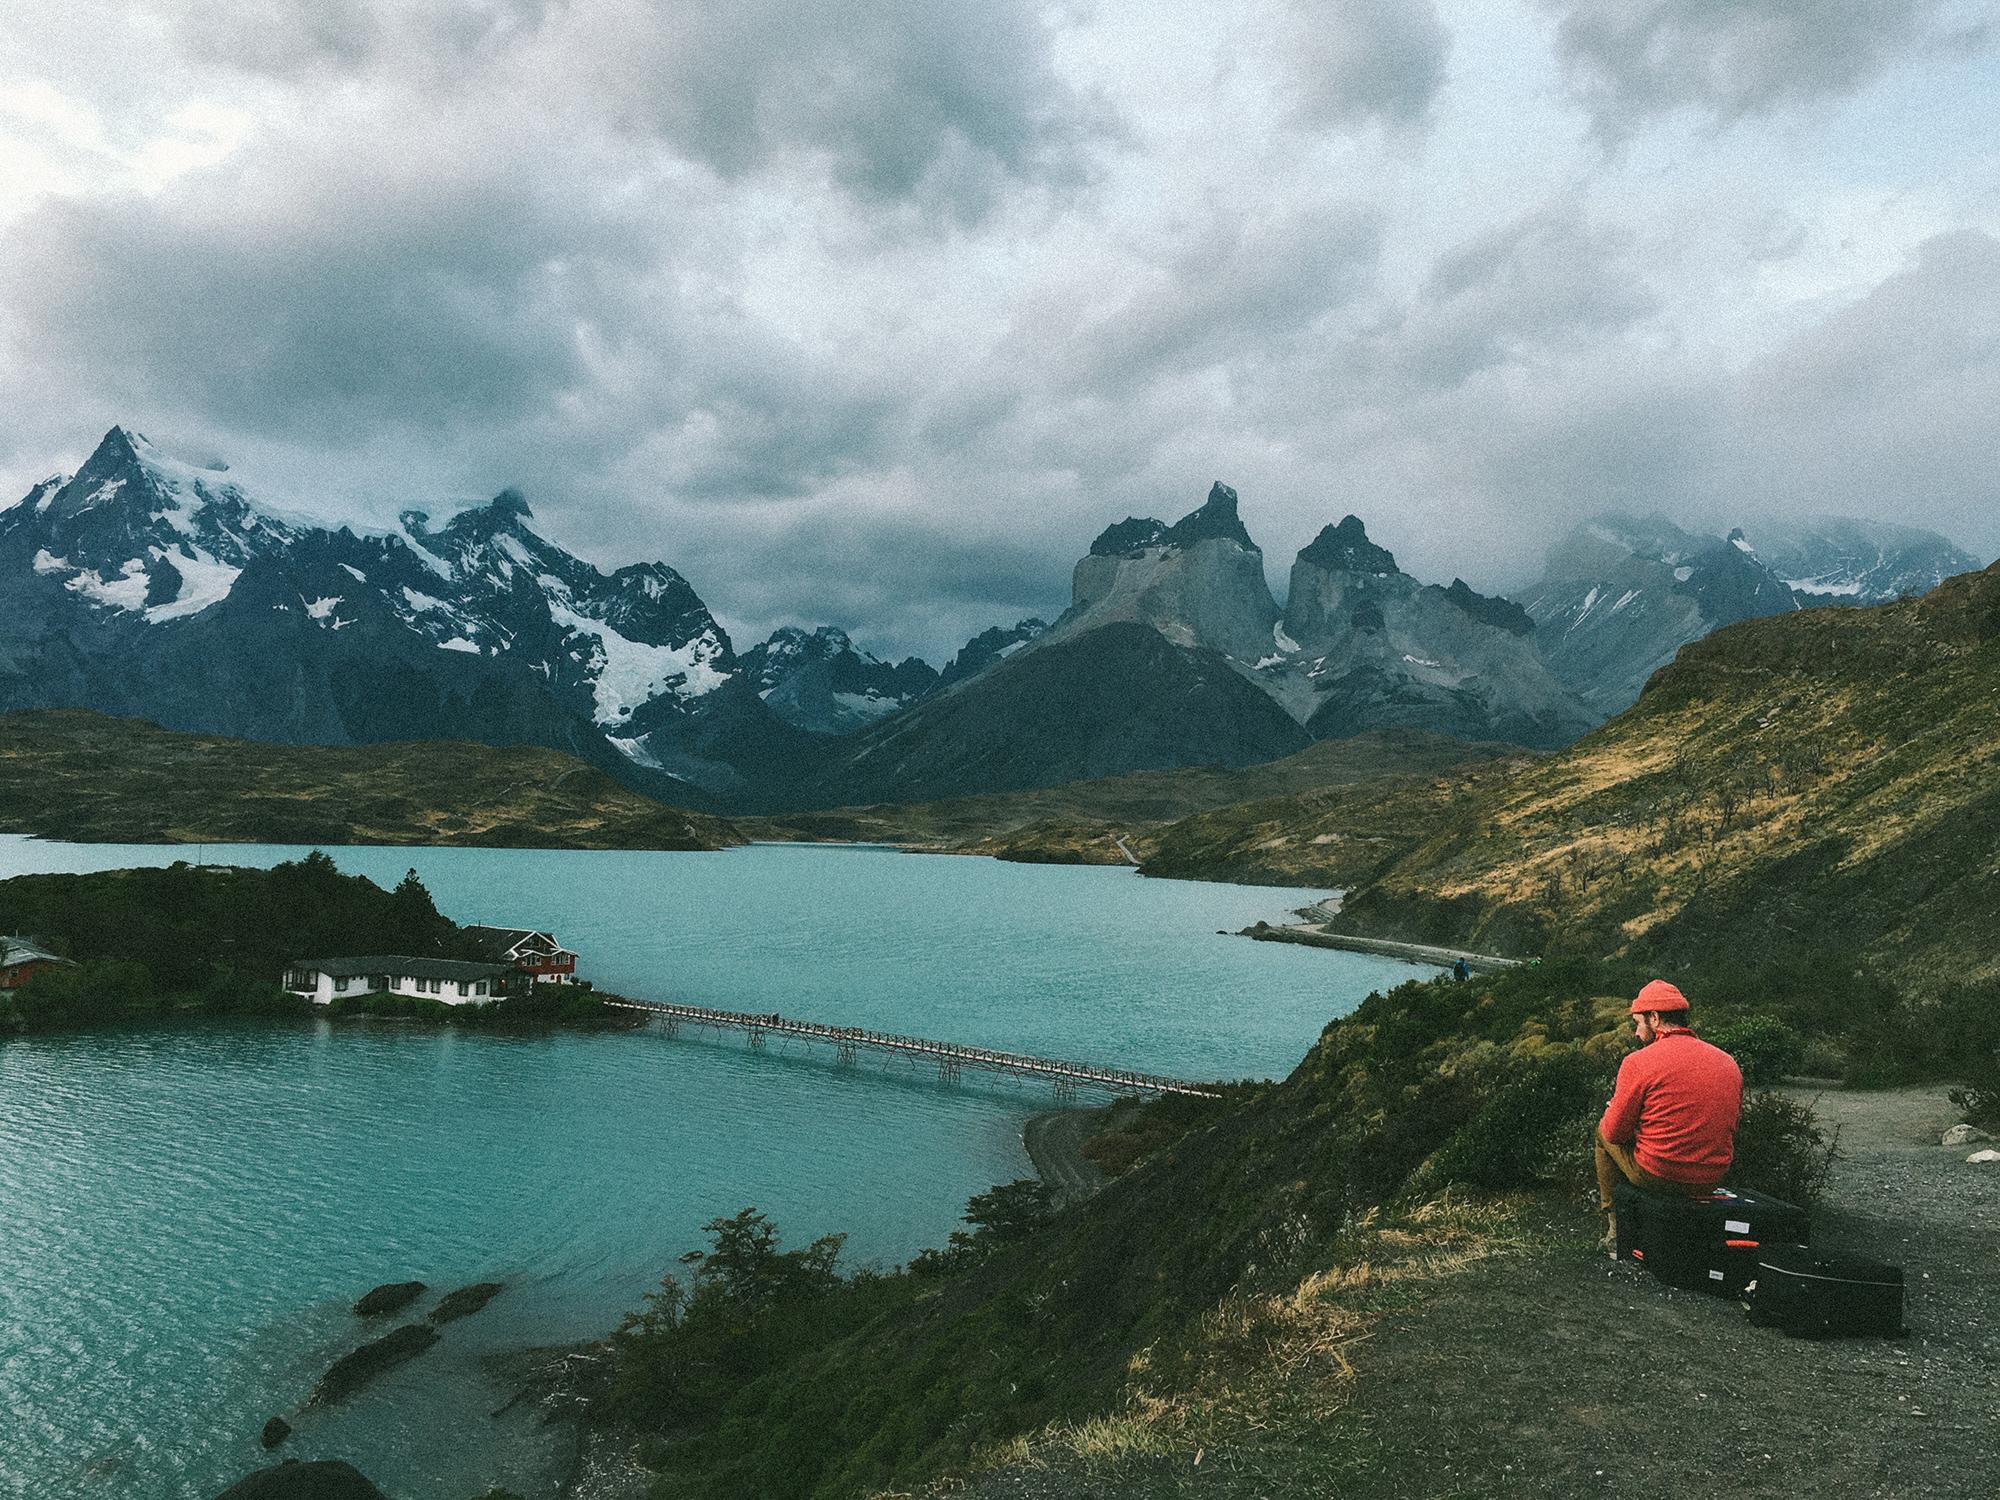 patagonia_08.jpg